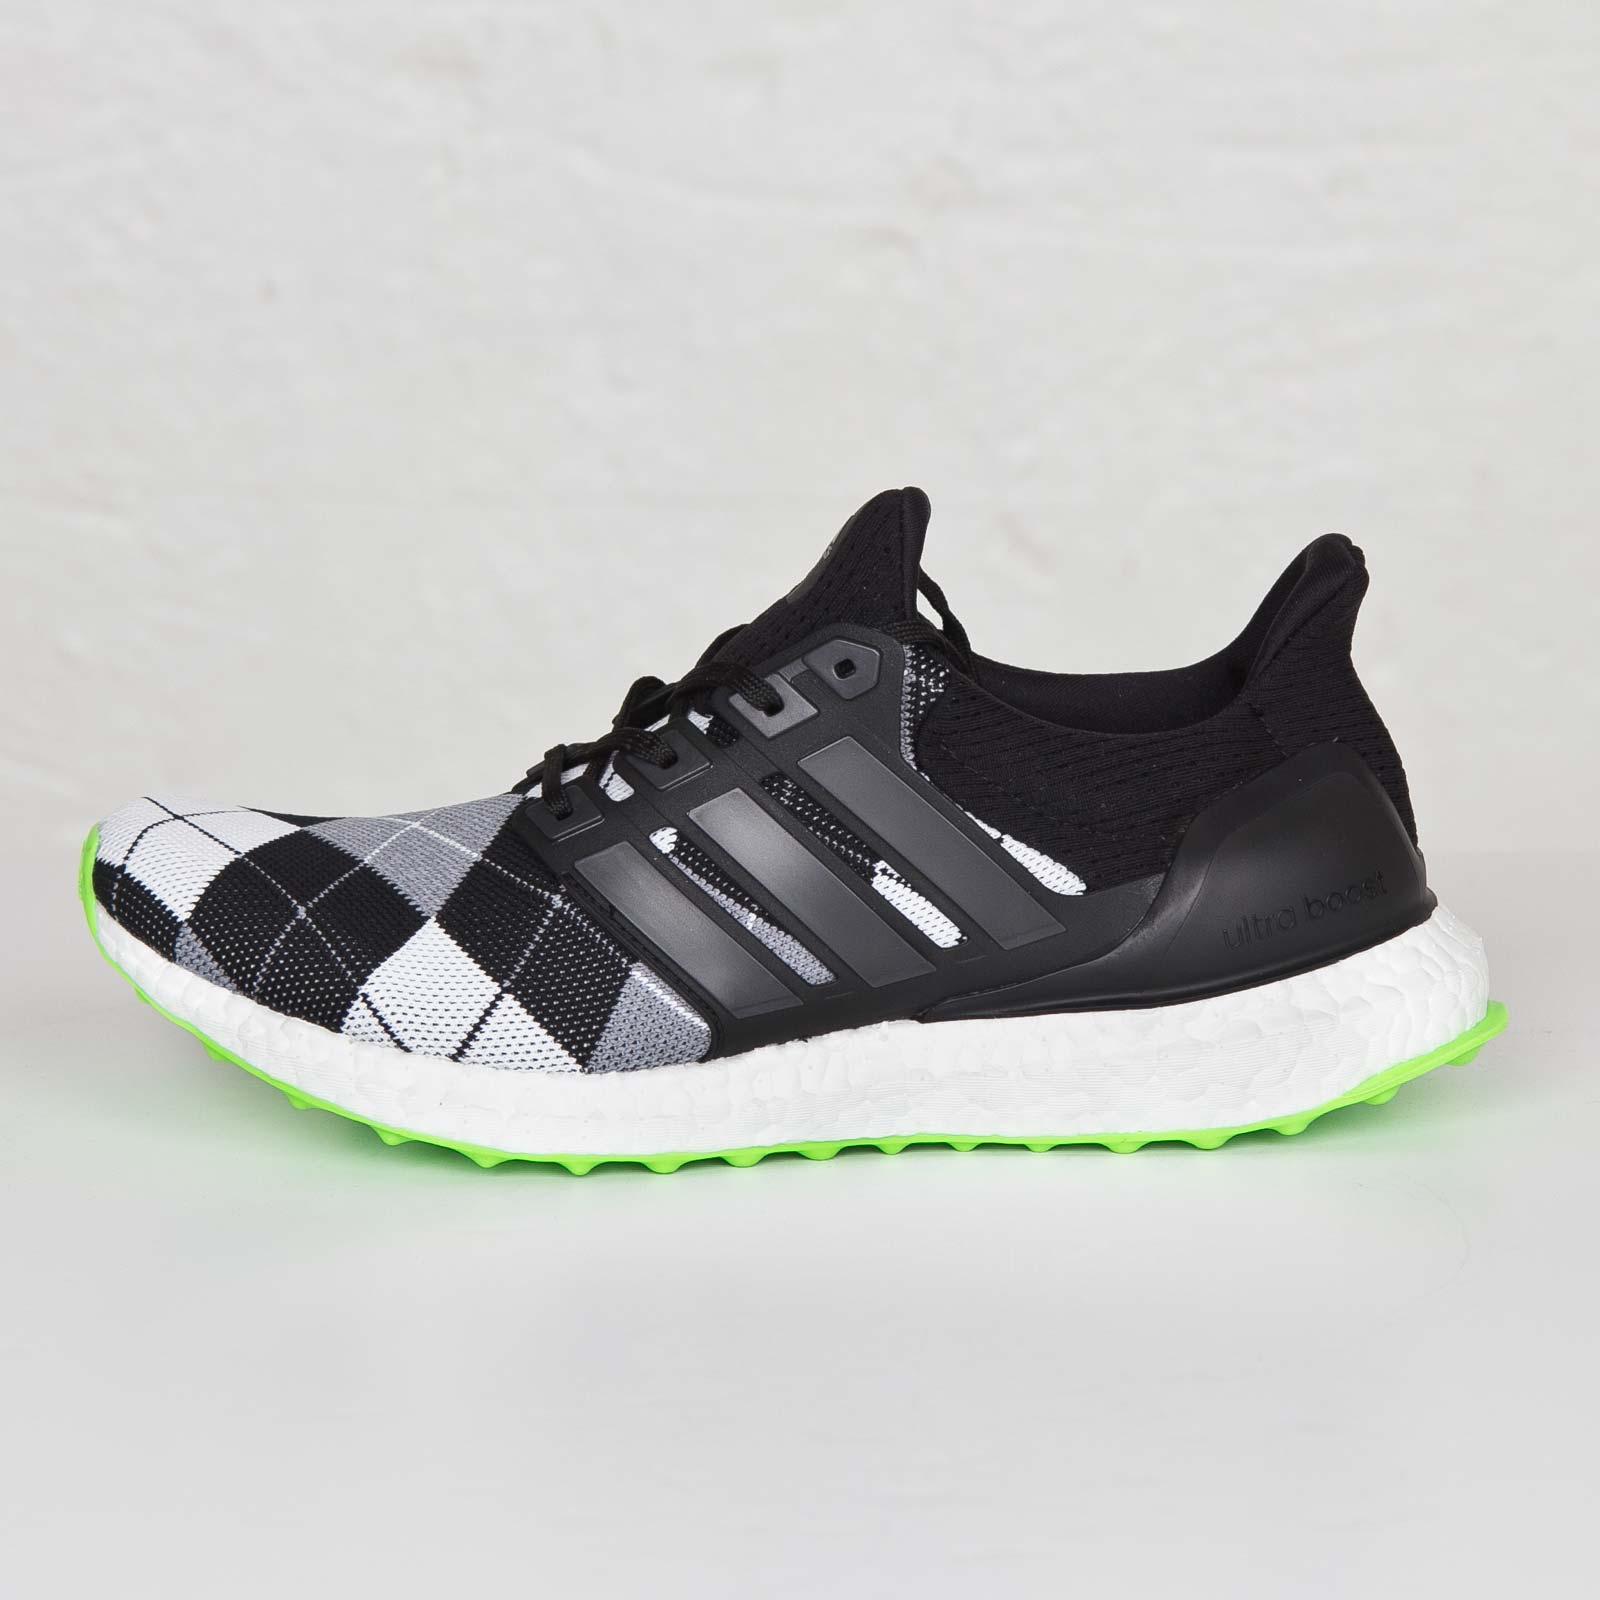 707a5d1b22070 france 1805 adidas ultraboost uncaged mens training running shoes da9164  38fb4 00aa5  50% off adidas ultra boost kva 0b4c6 fbd66